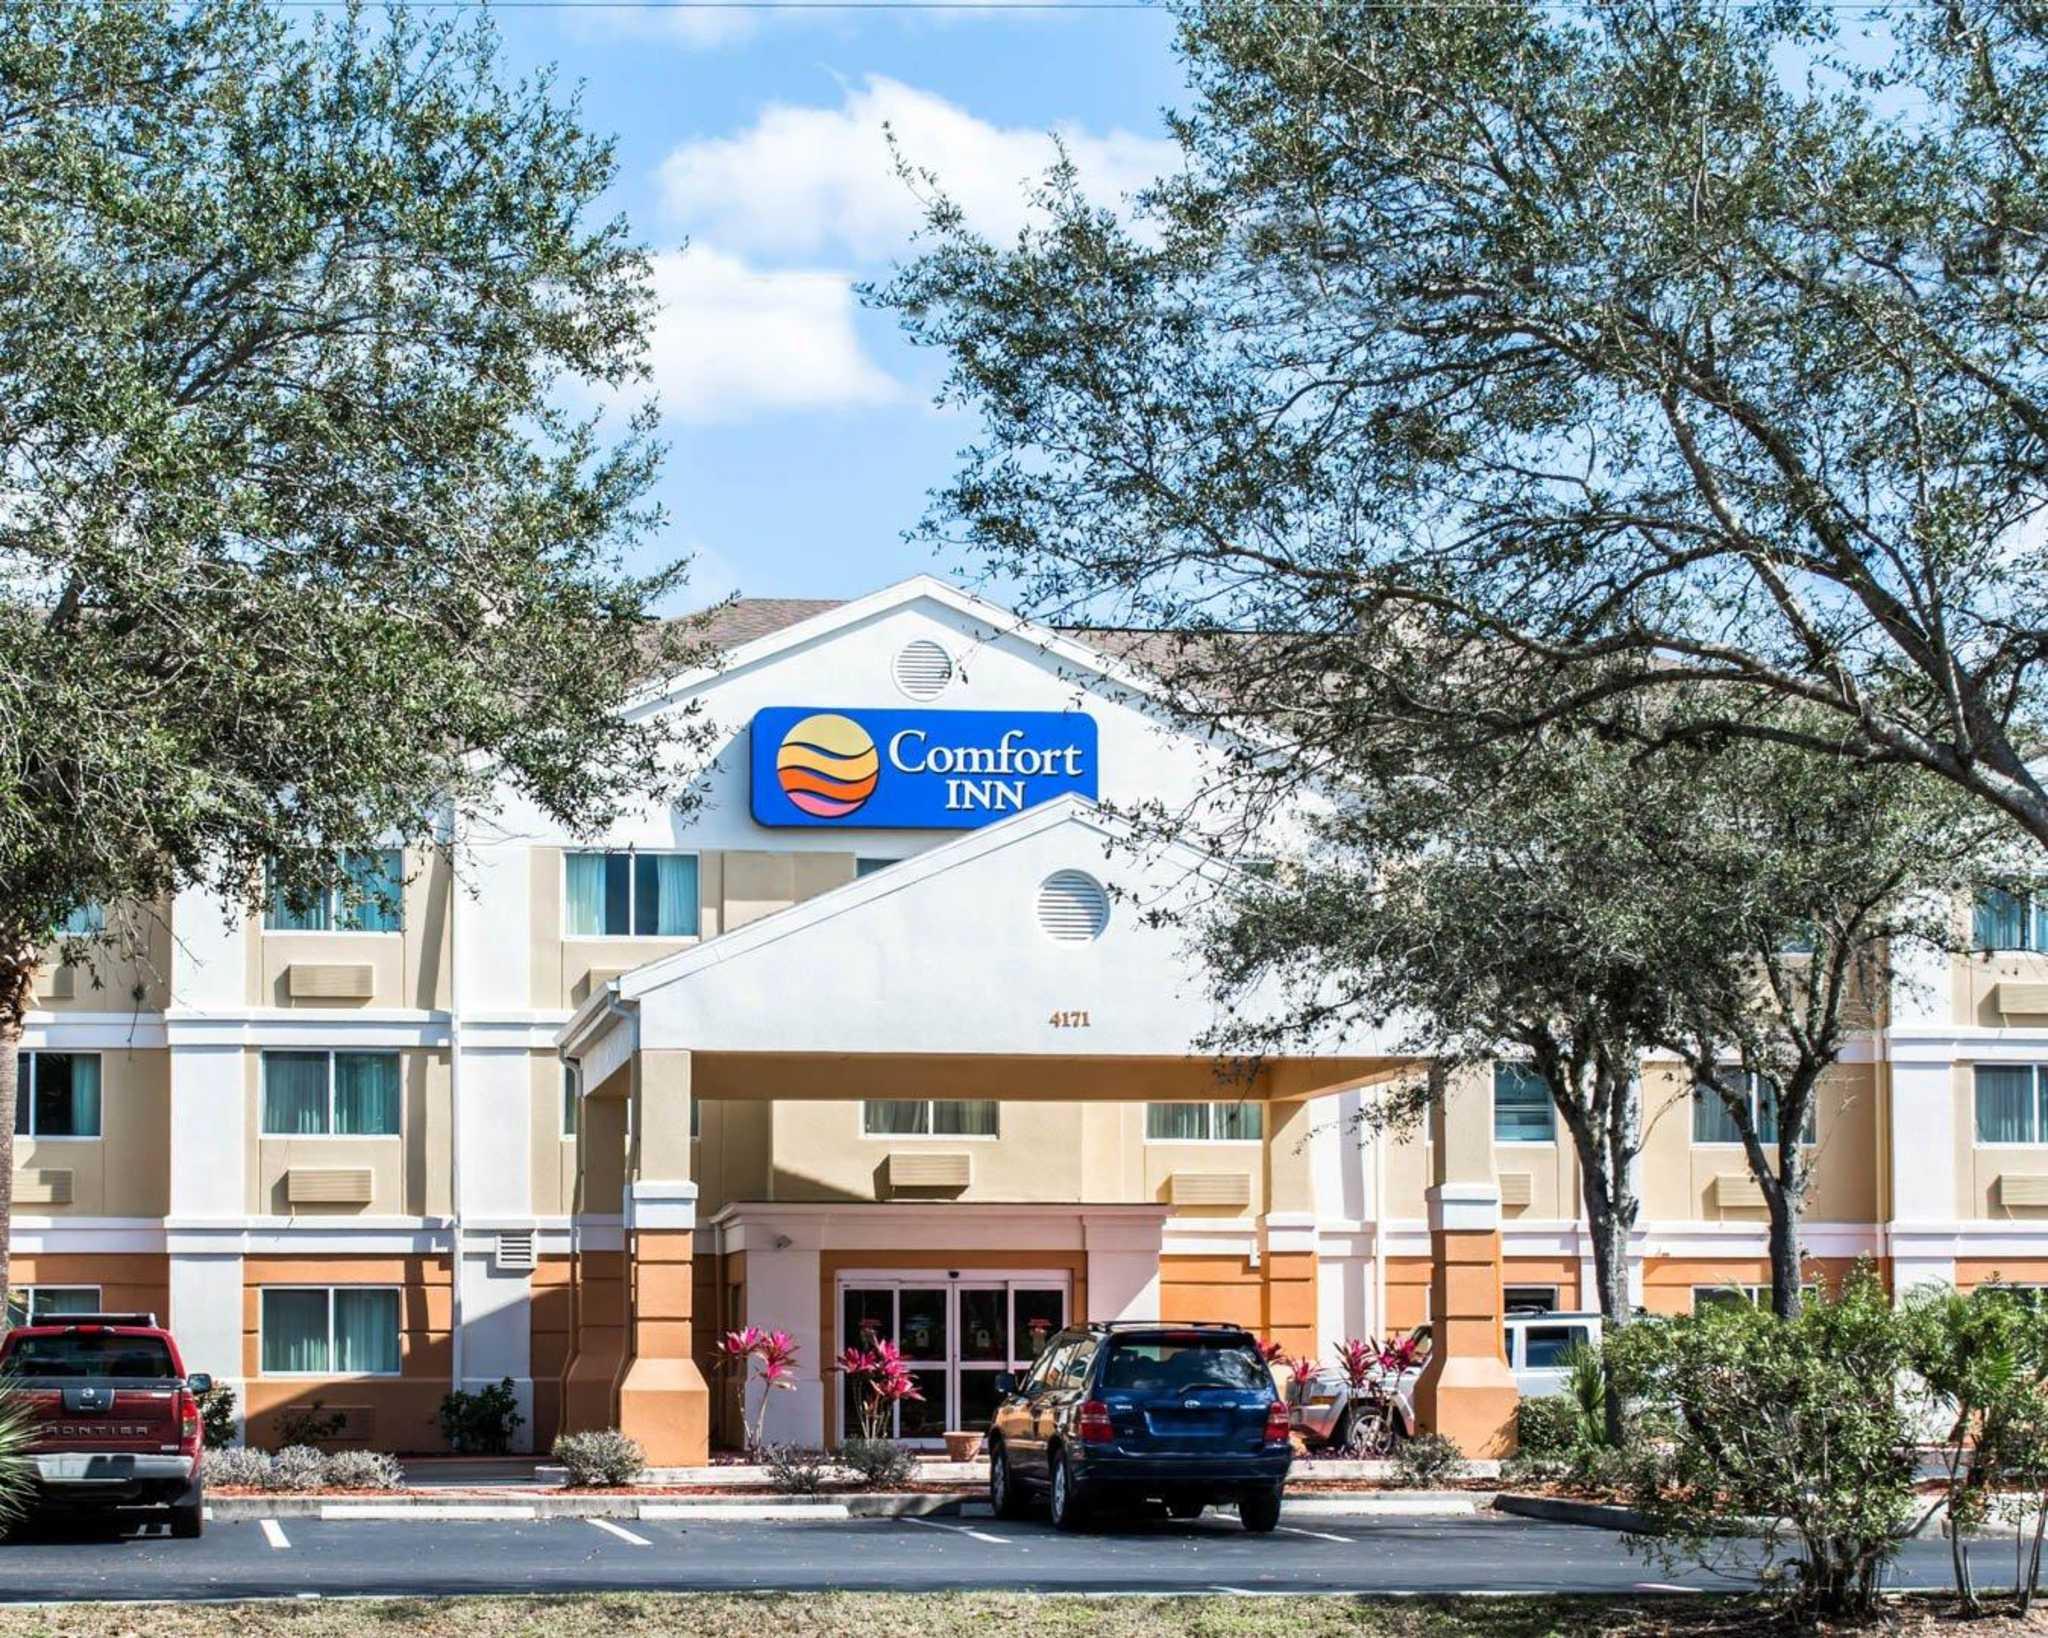 Comfort Inn Fort Myers Northeast image 1